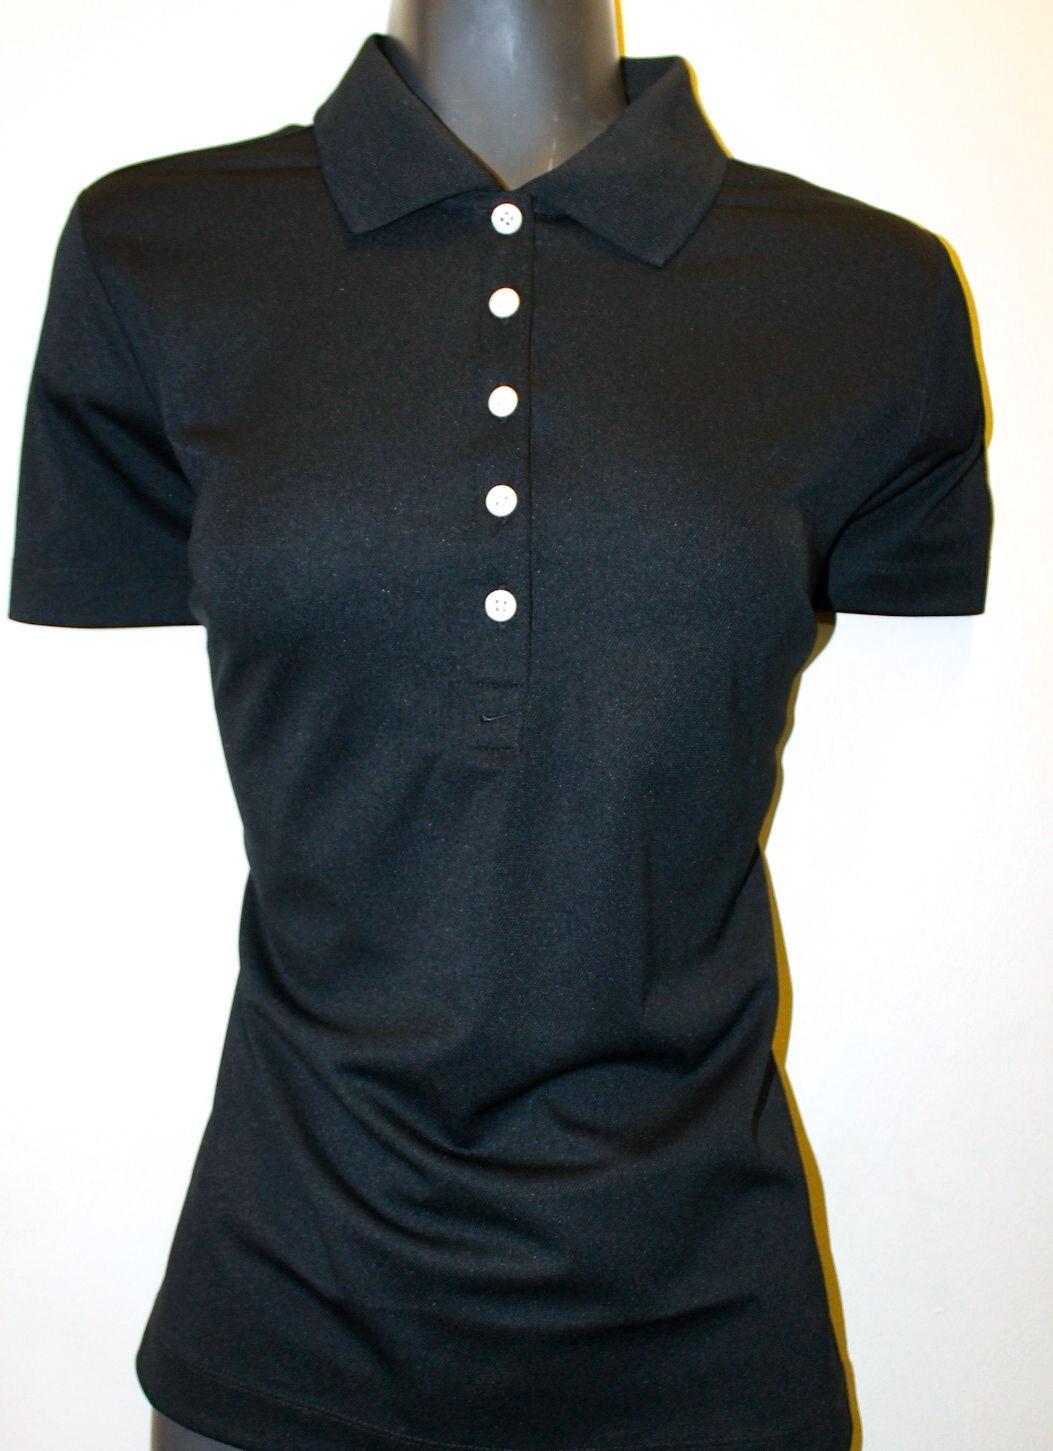 b4e6fea4 S l1600. S l1600. Previous. NWT Nike Golf Tour Performance Shirt Short Sleeve  Ladies Black Dri Fit Medium